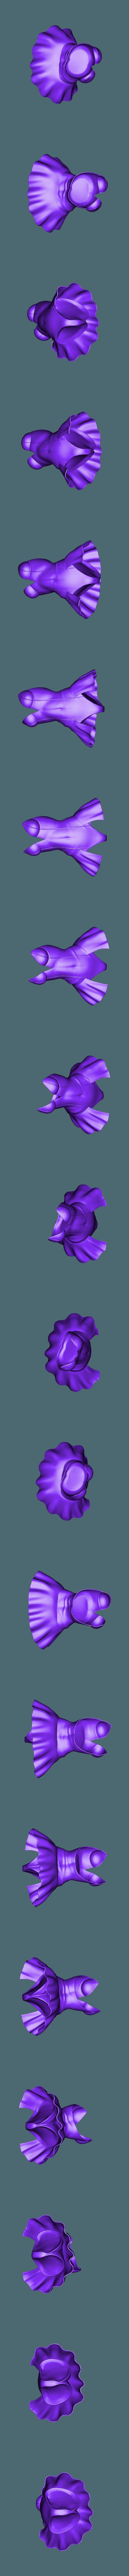 Baska.stl Download free STL file SINoALICE composite, printable • 3D printable model, HARZLabs